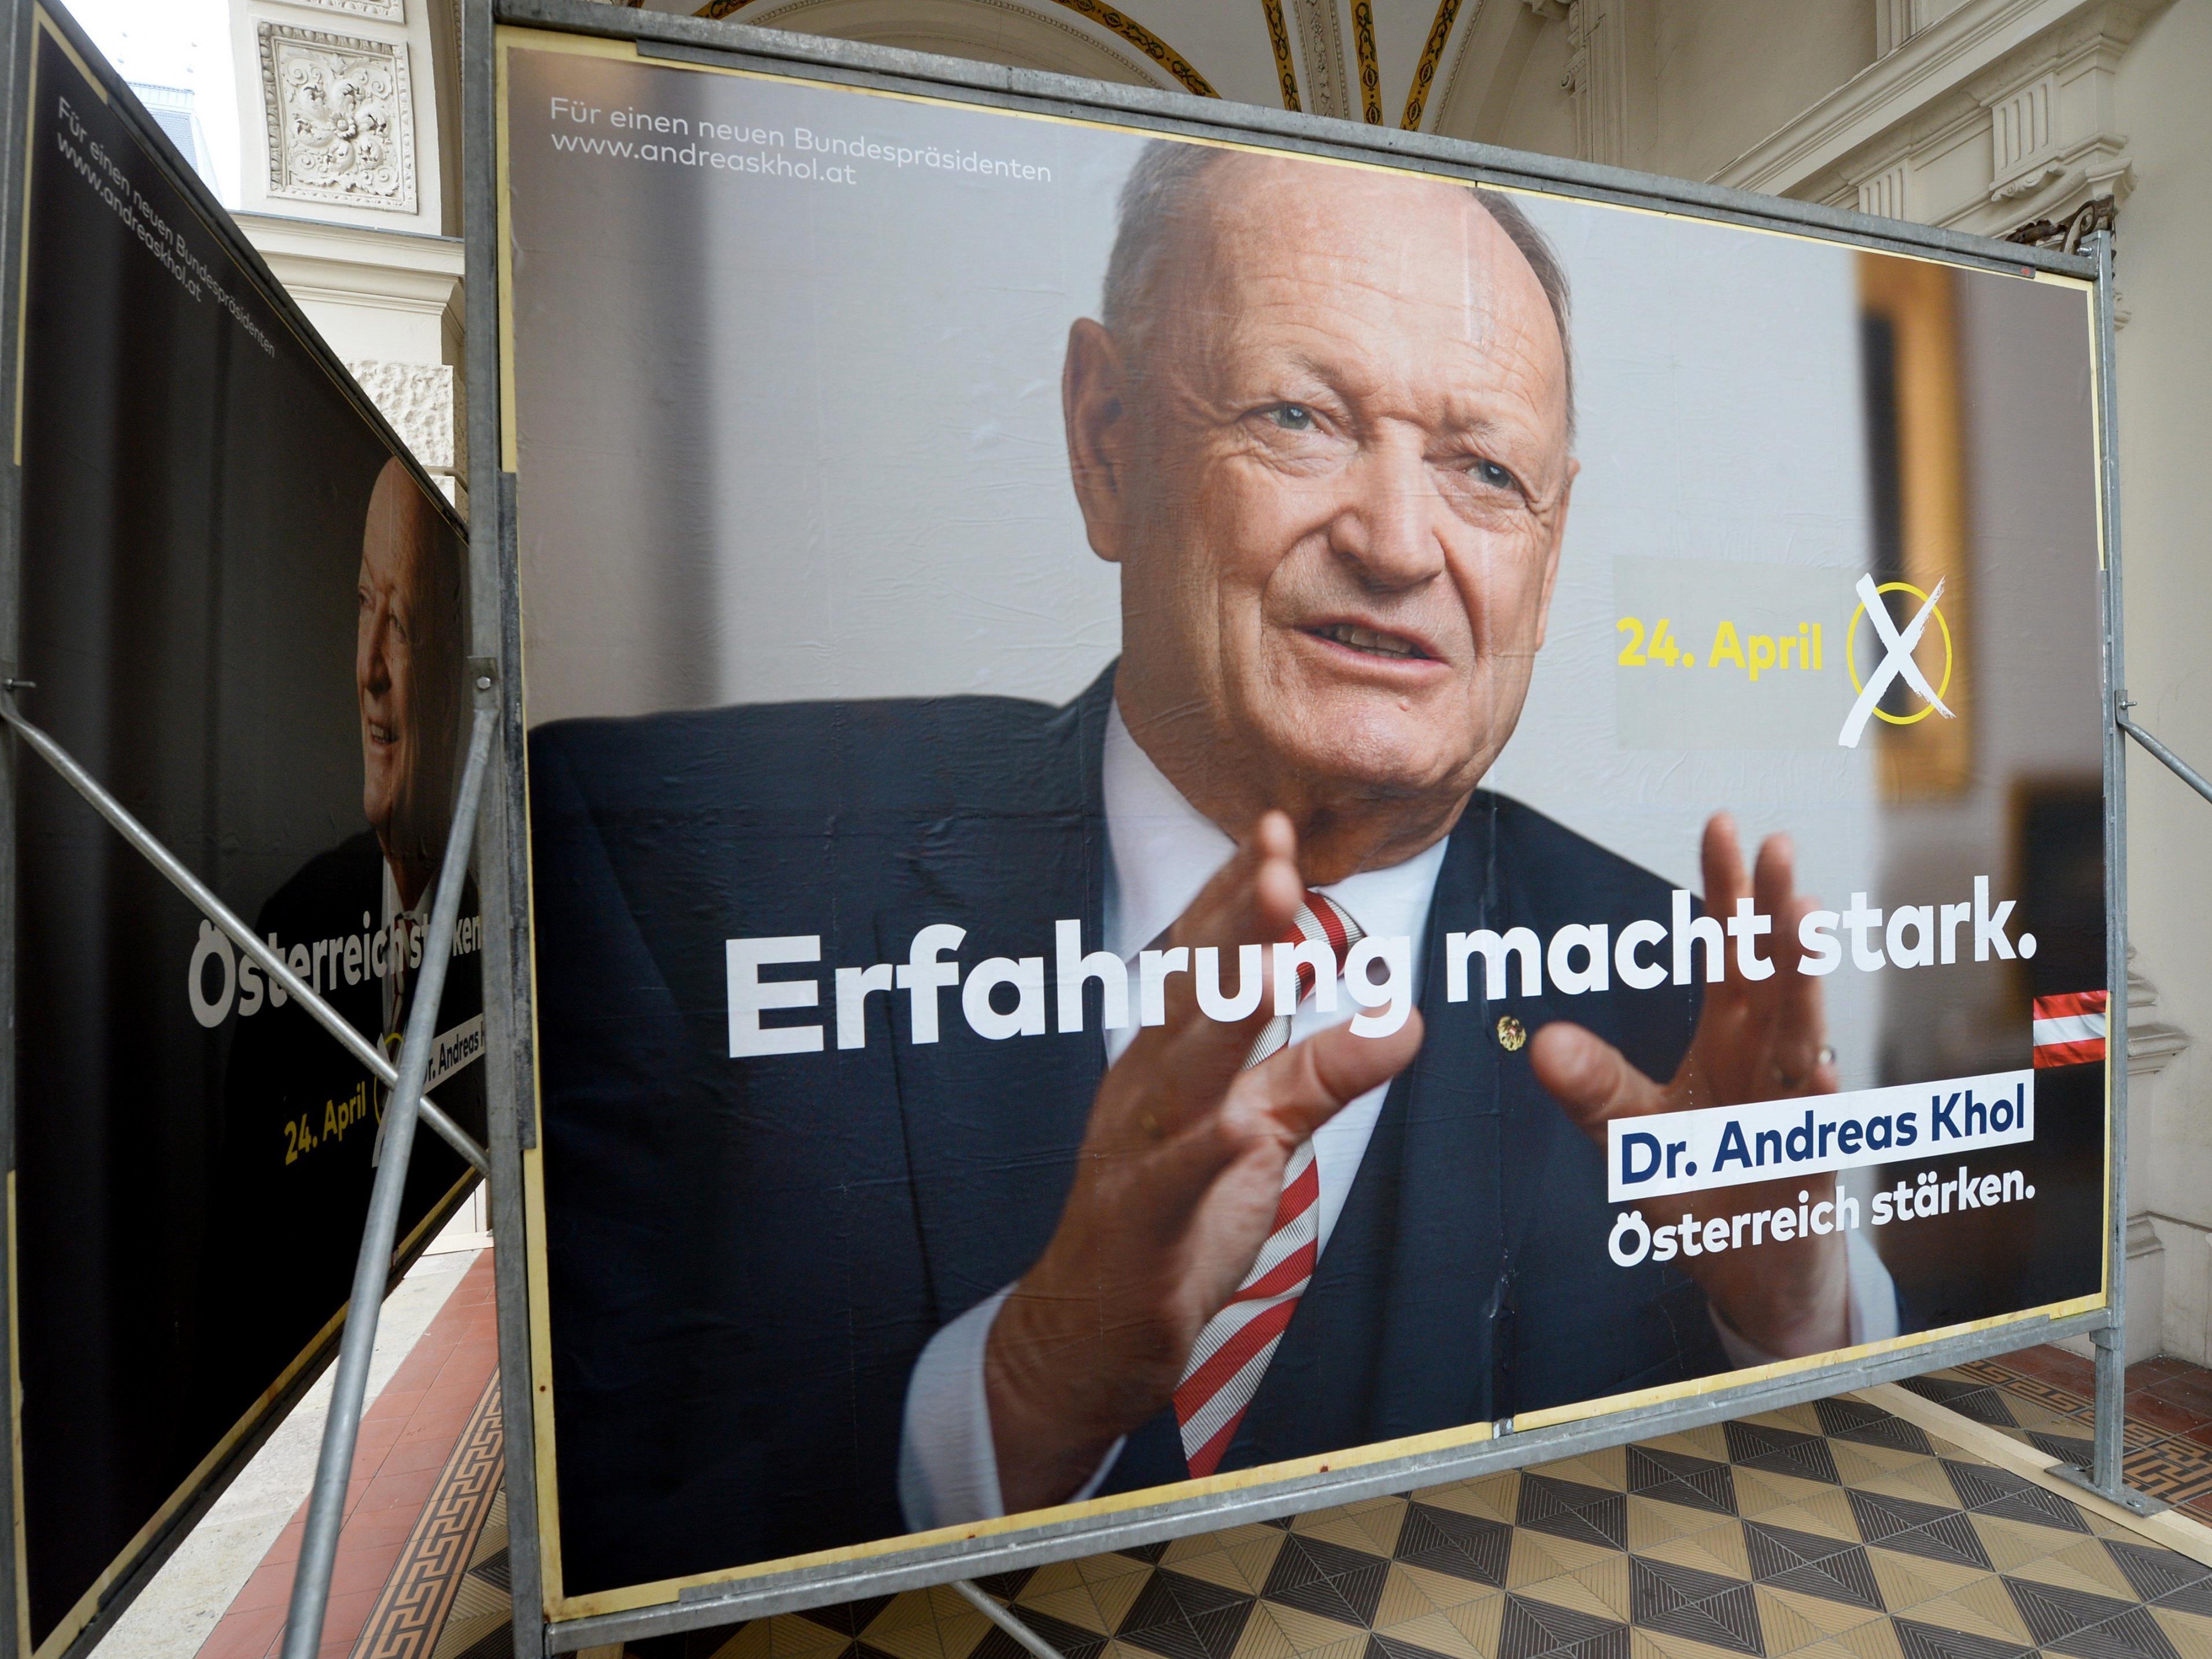 Die ÖVP hat die Plakatkampagne für Andreas Khol vorgestellt.